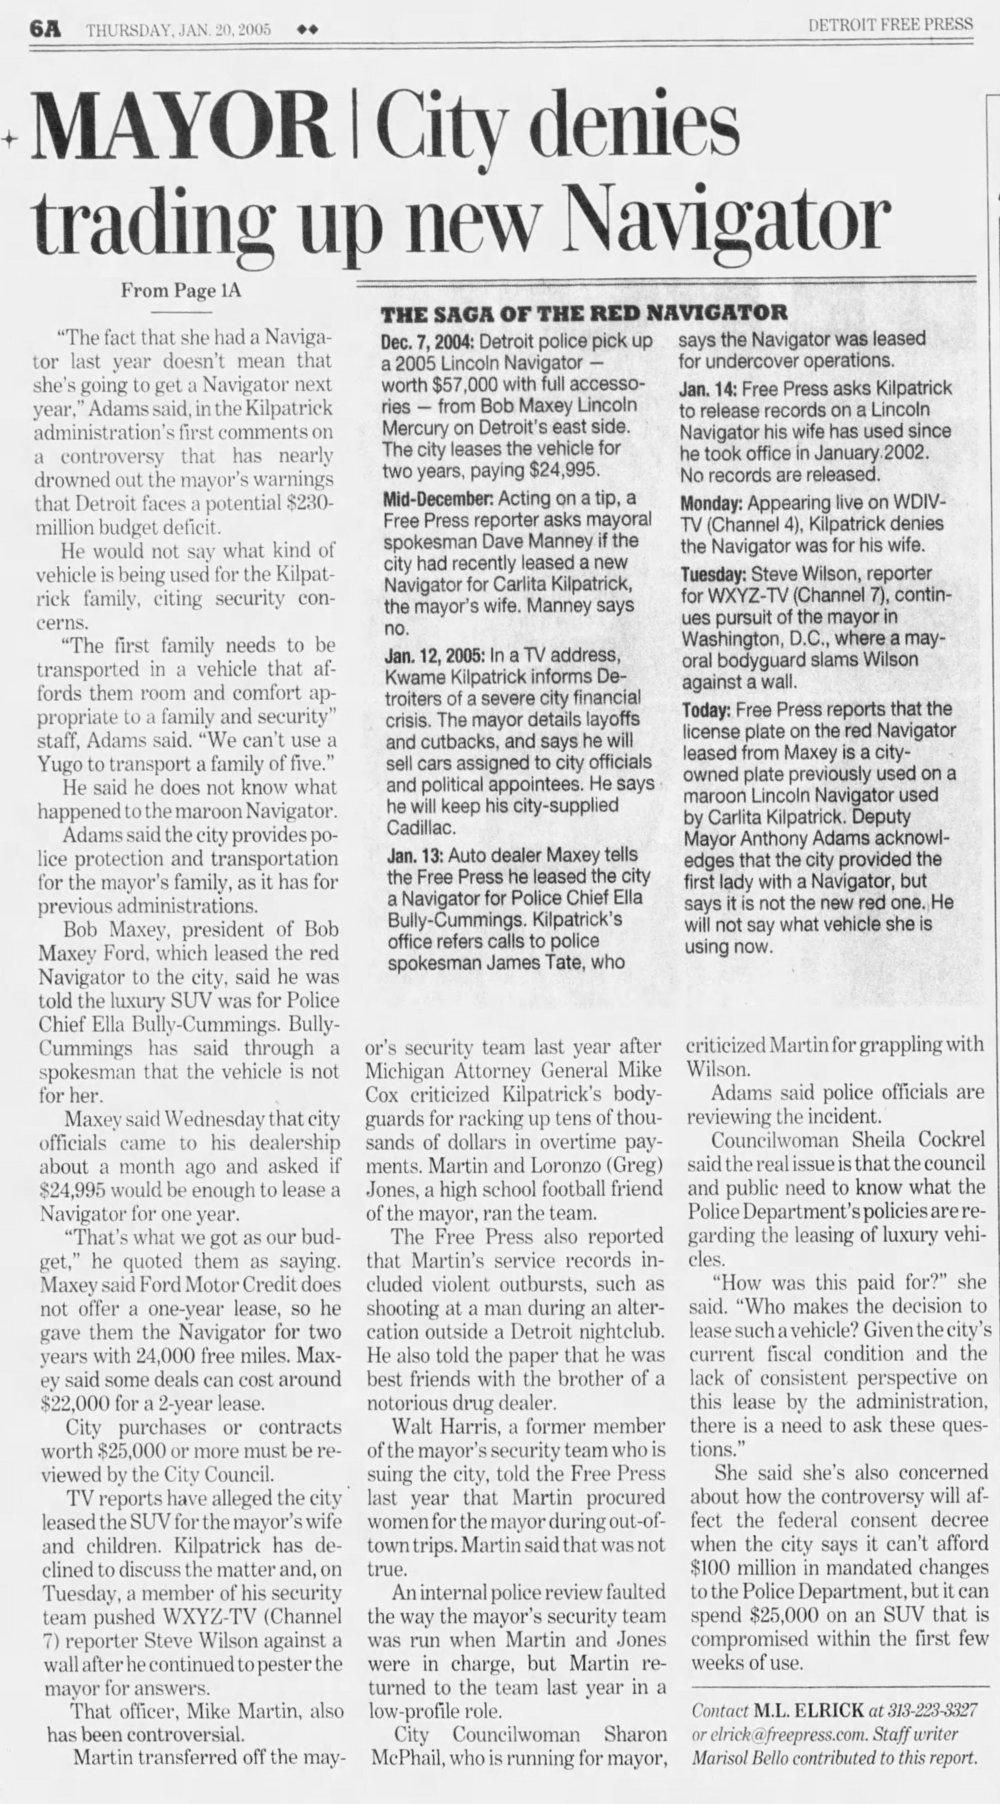 Detroit_Free_Press_Thu__Jan_20__2005_ (1).jpg